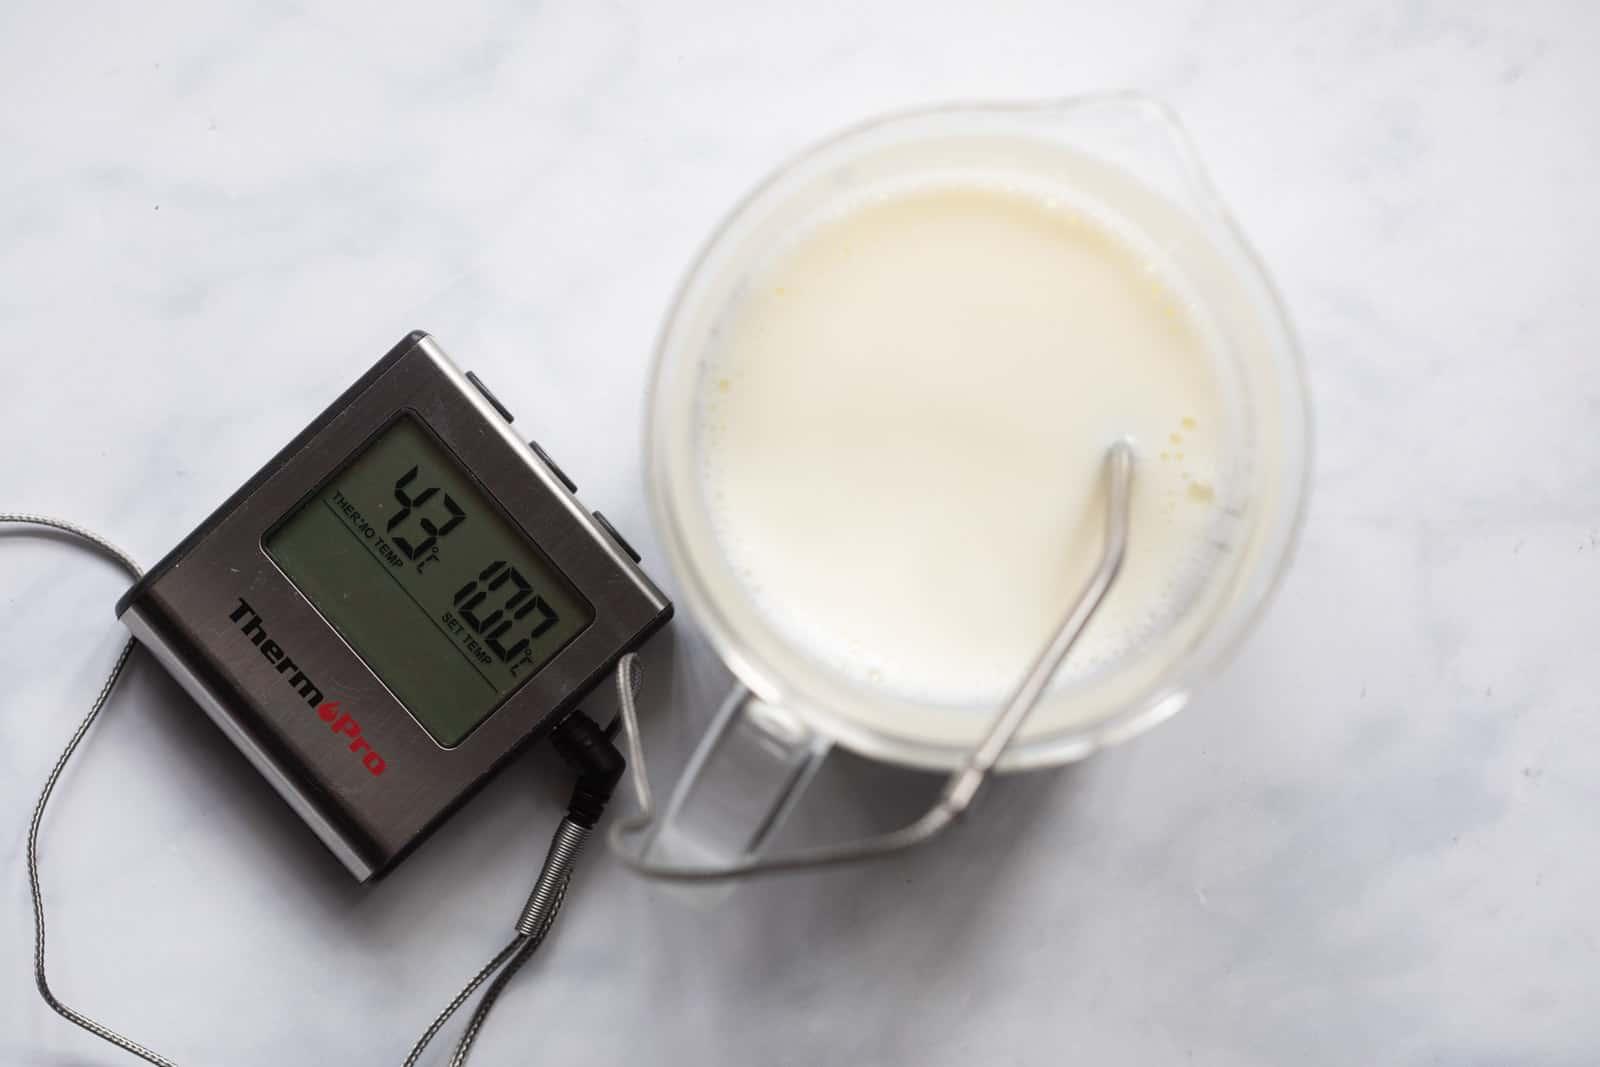 Temperature of the milk optimum for setting yogurt